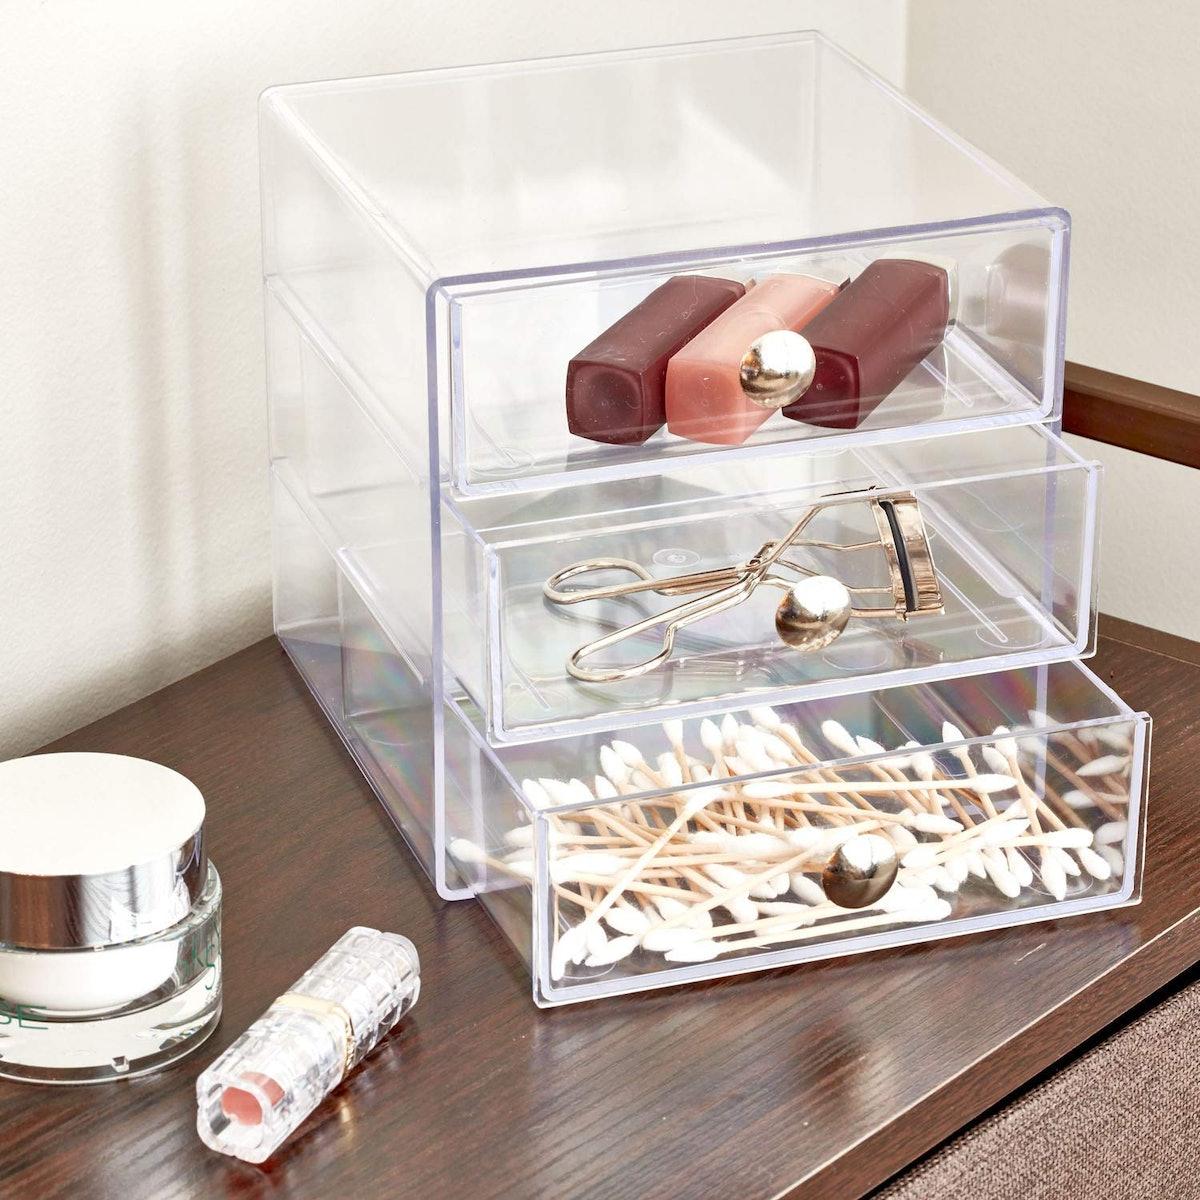 InterDesign 3-Drawer Storage Container with Knobs